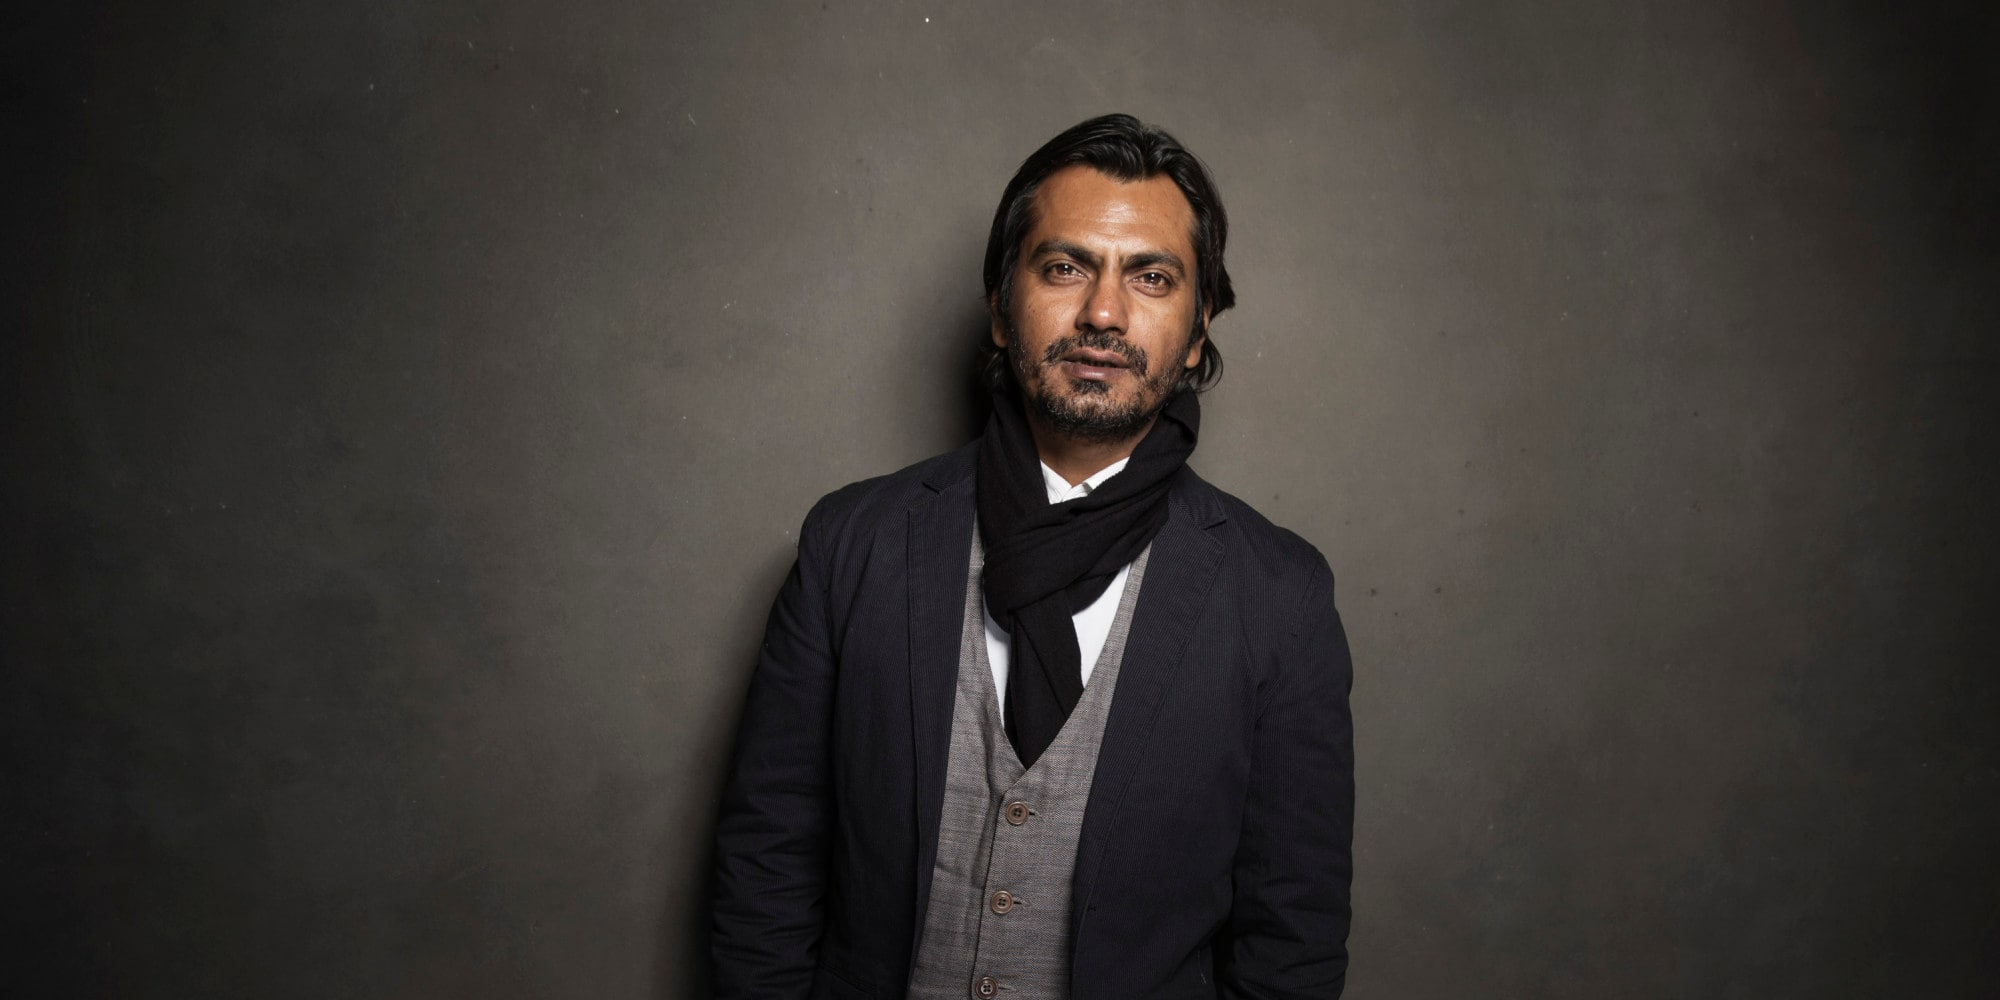 Nawazuddin Siddiqui Takes Inspiration From James Bond Movies For His Next 'Babumoshai Bandookbaaz'